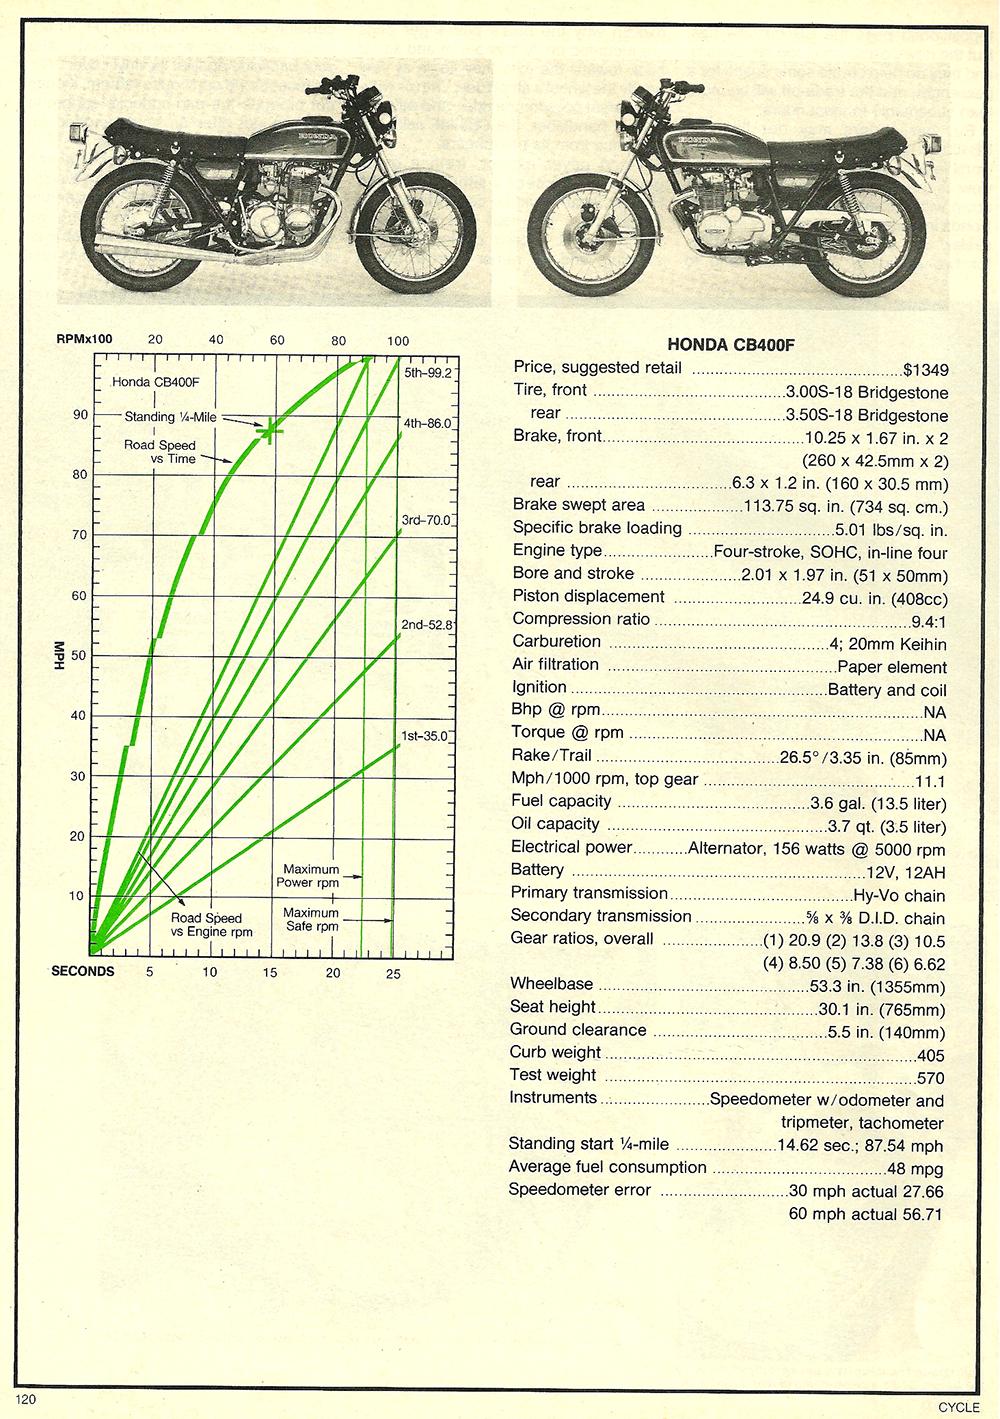 1977 Honda CB400F road test 04.jpg